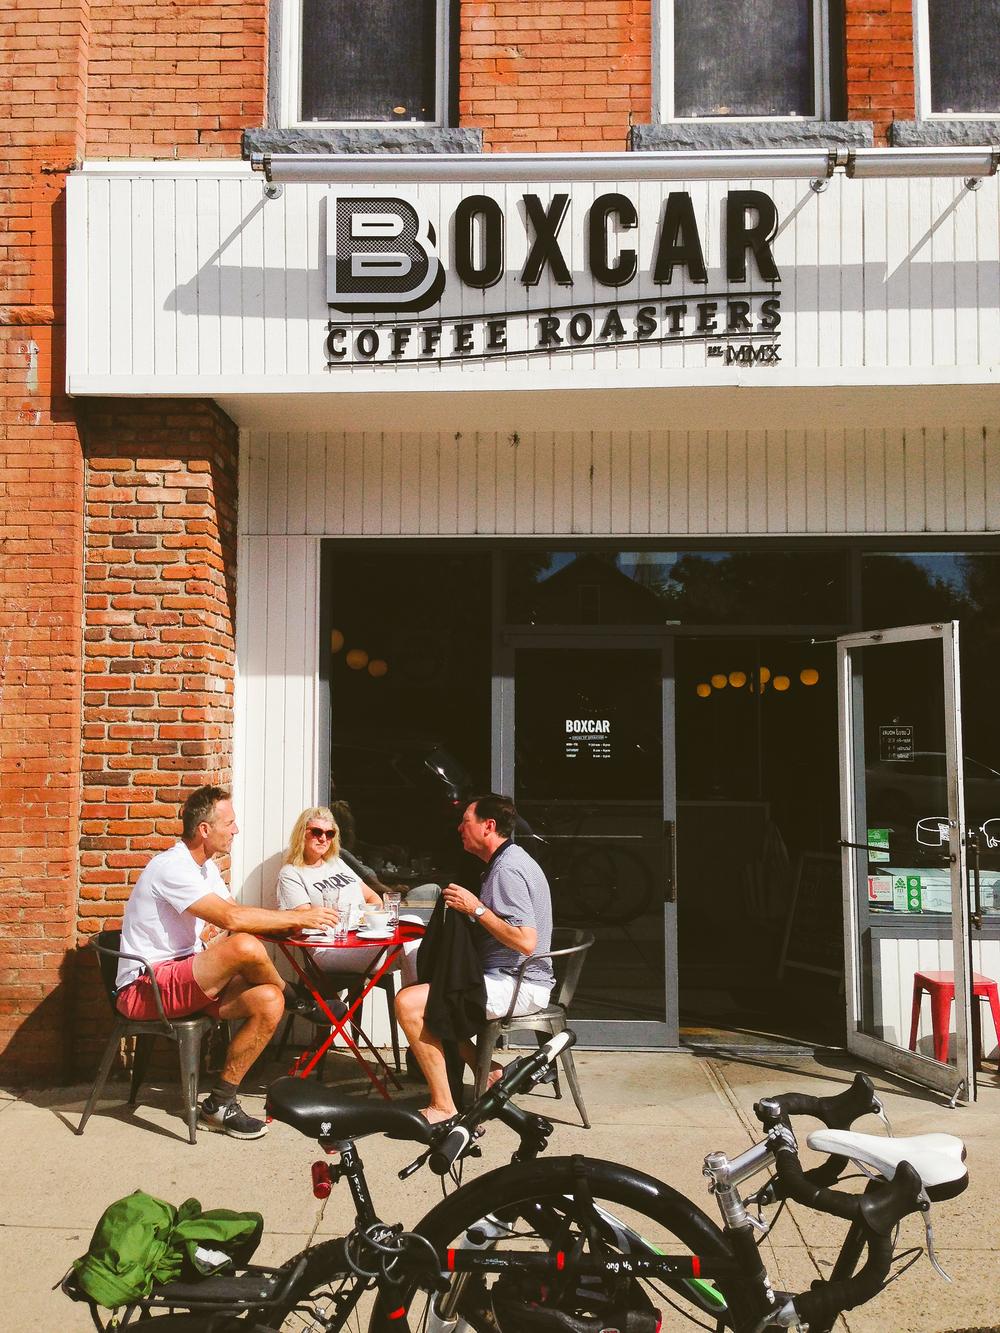 boxcar-coffee-roaster-boulder-1